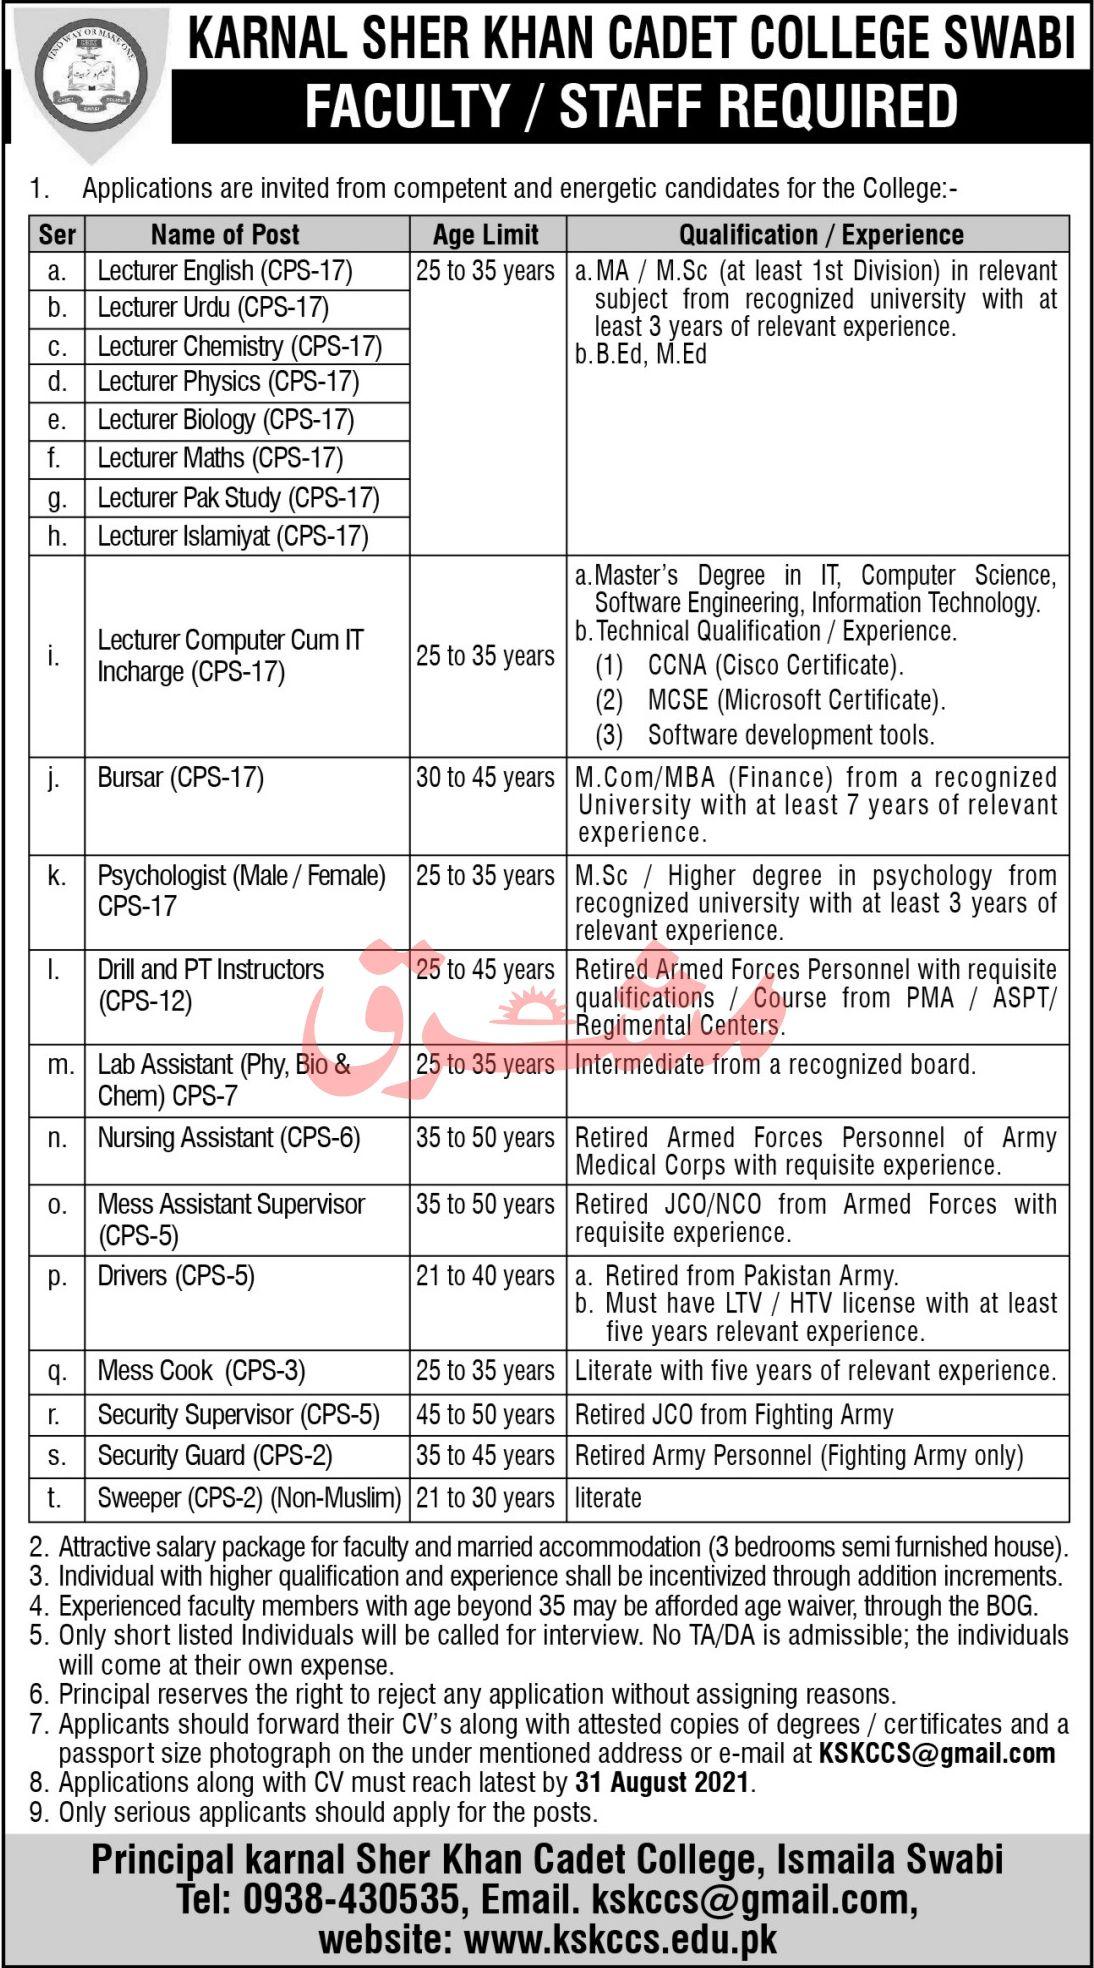 Karnal Sher Khan Cadet College Swabi Vacancies 2021 2